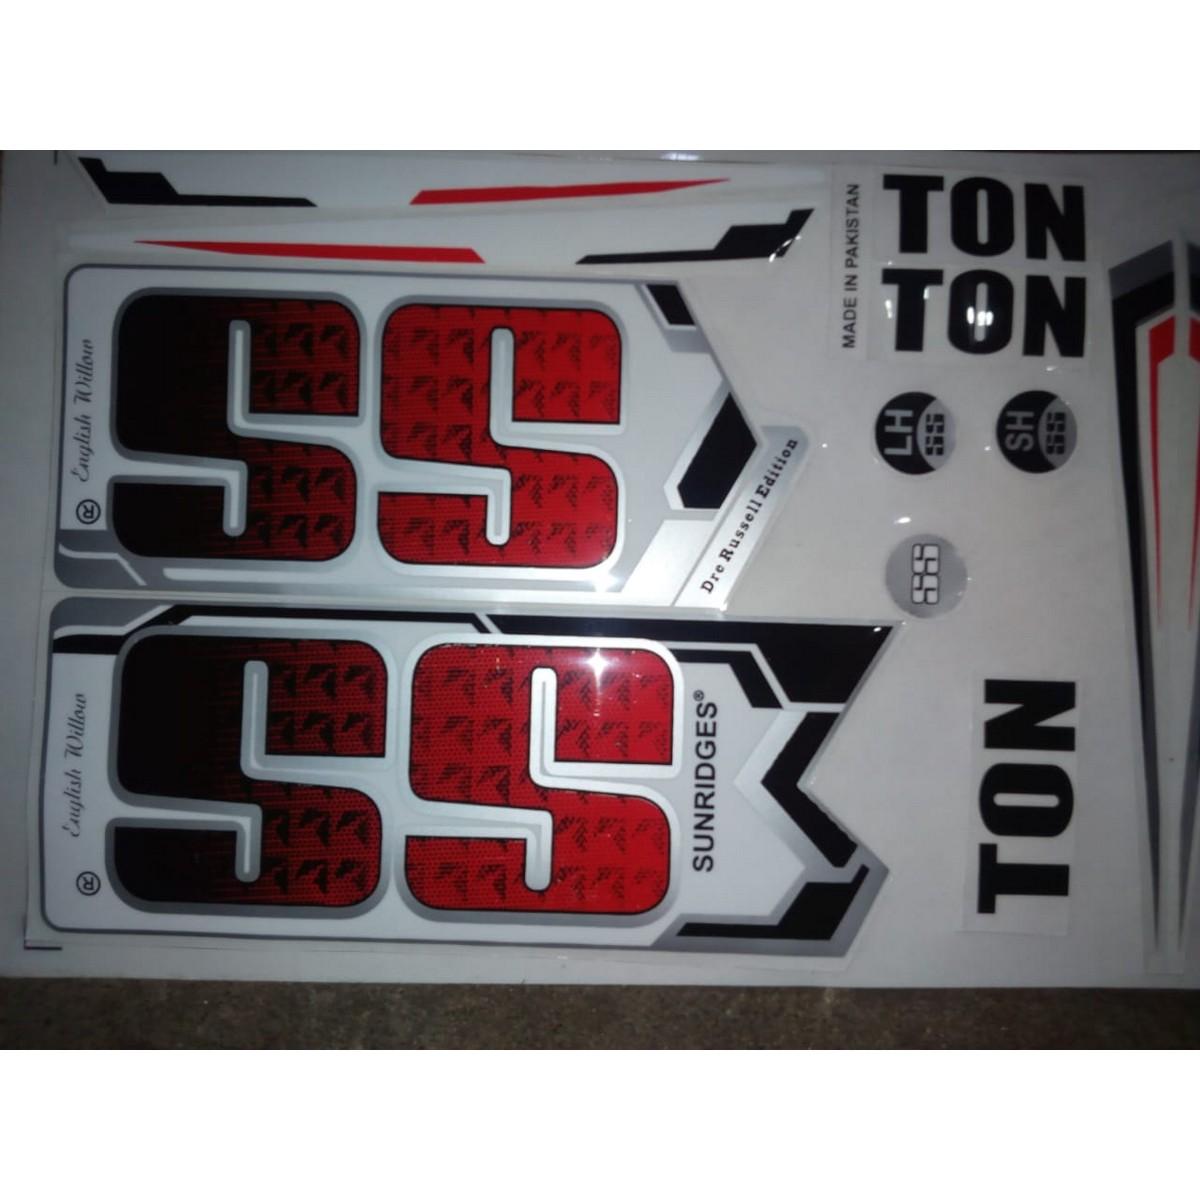 SS Sunridges TON Edition Cricket Bat Stickers [2D/Plain